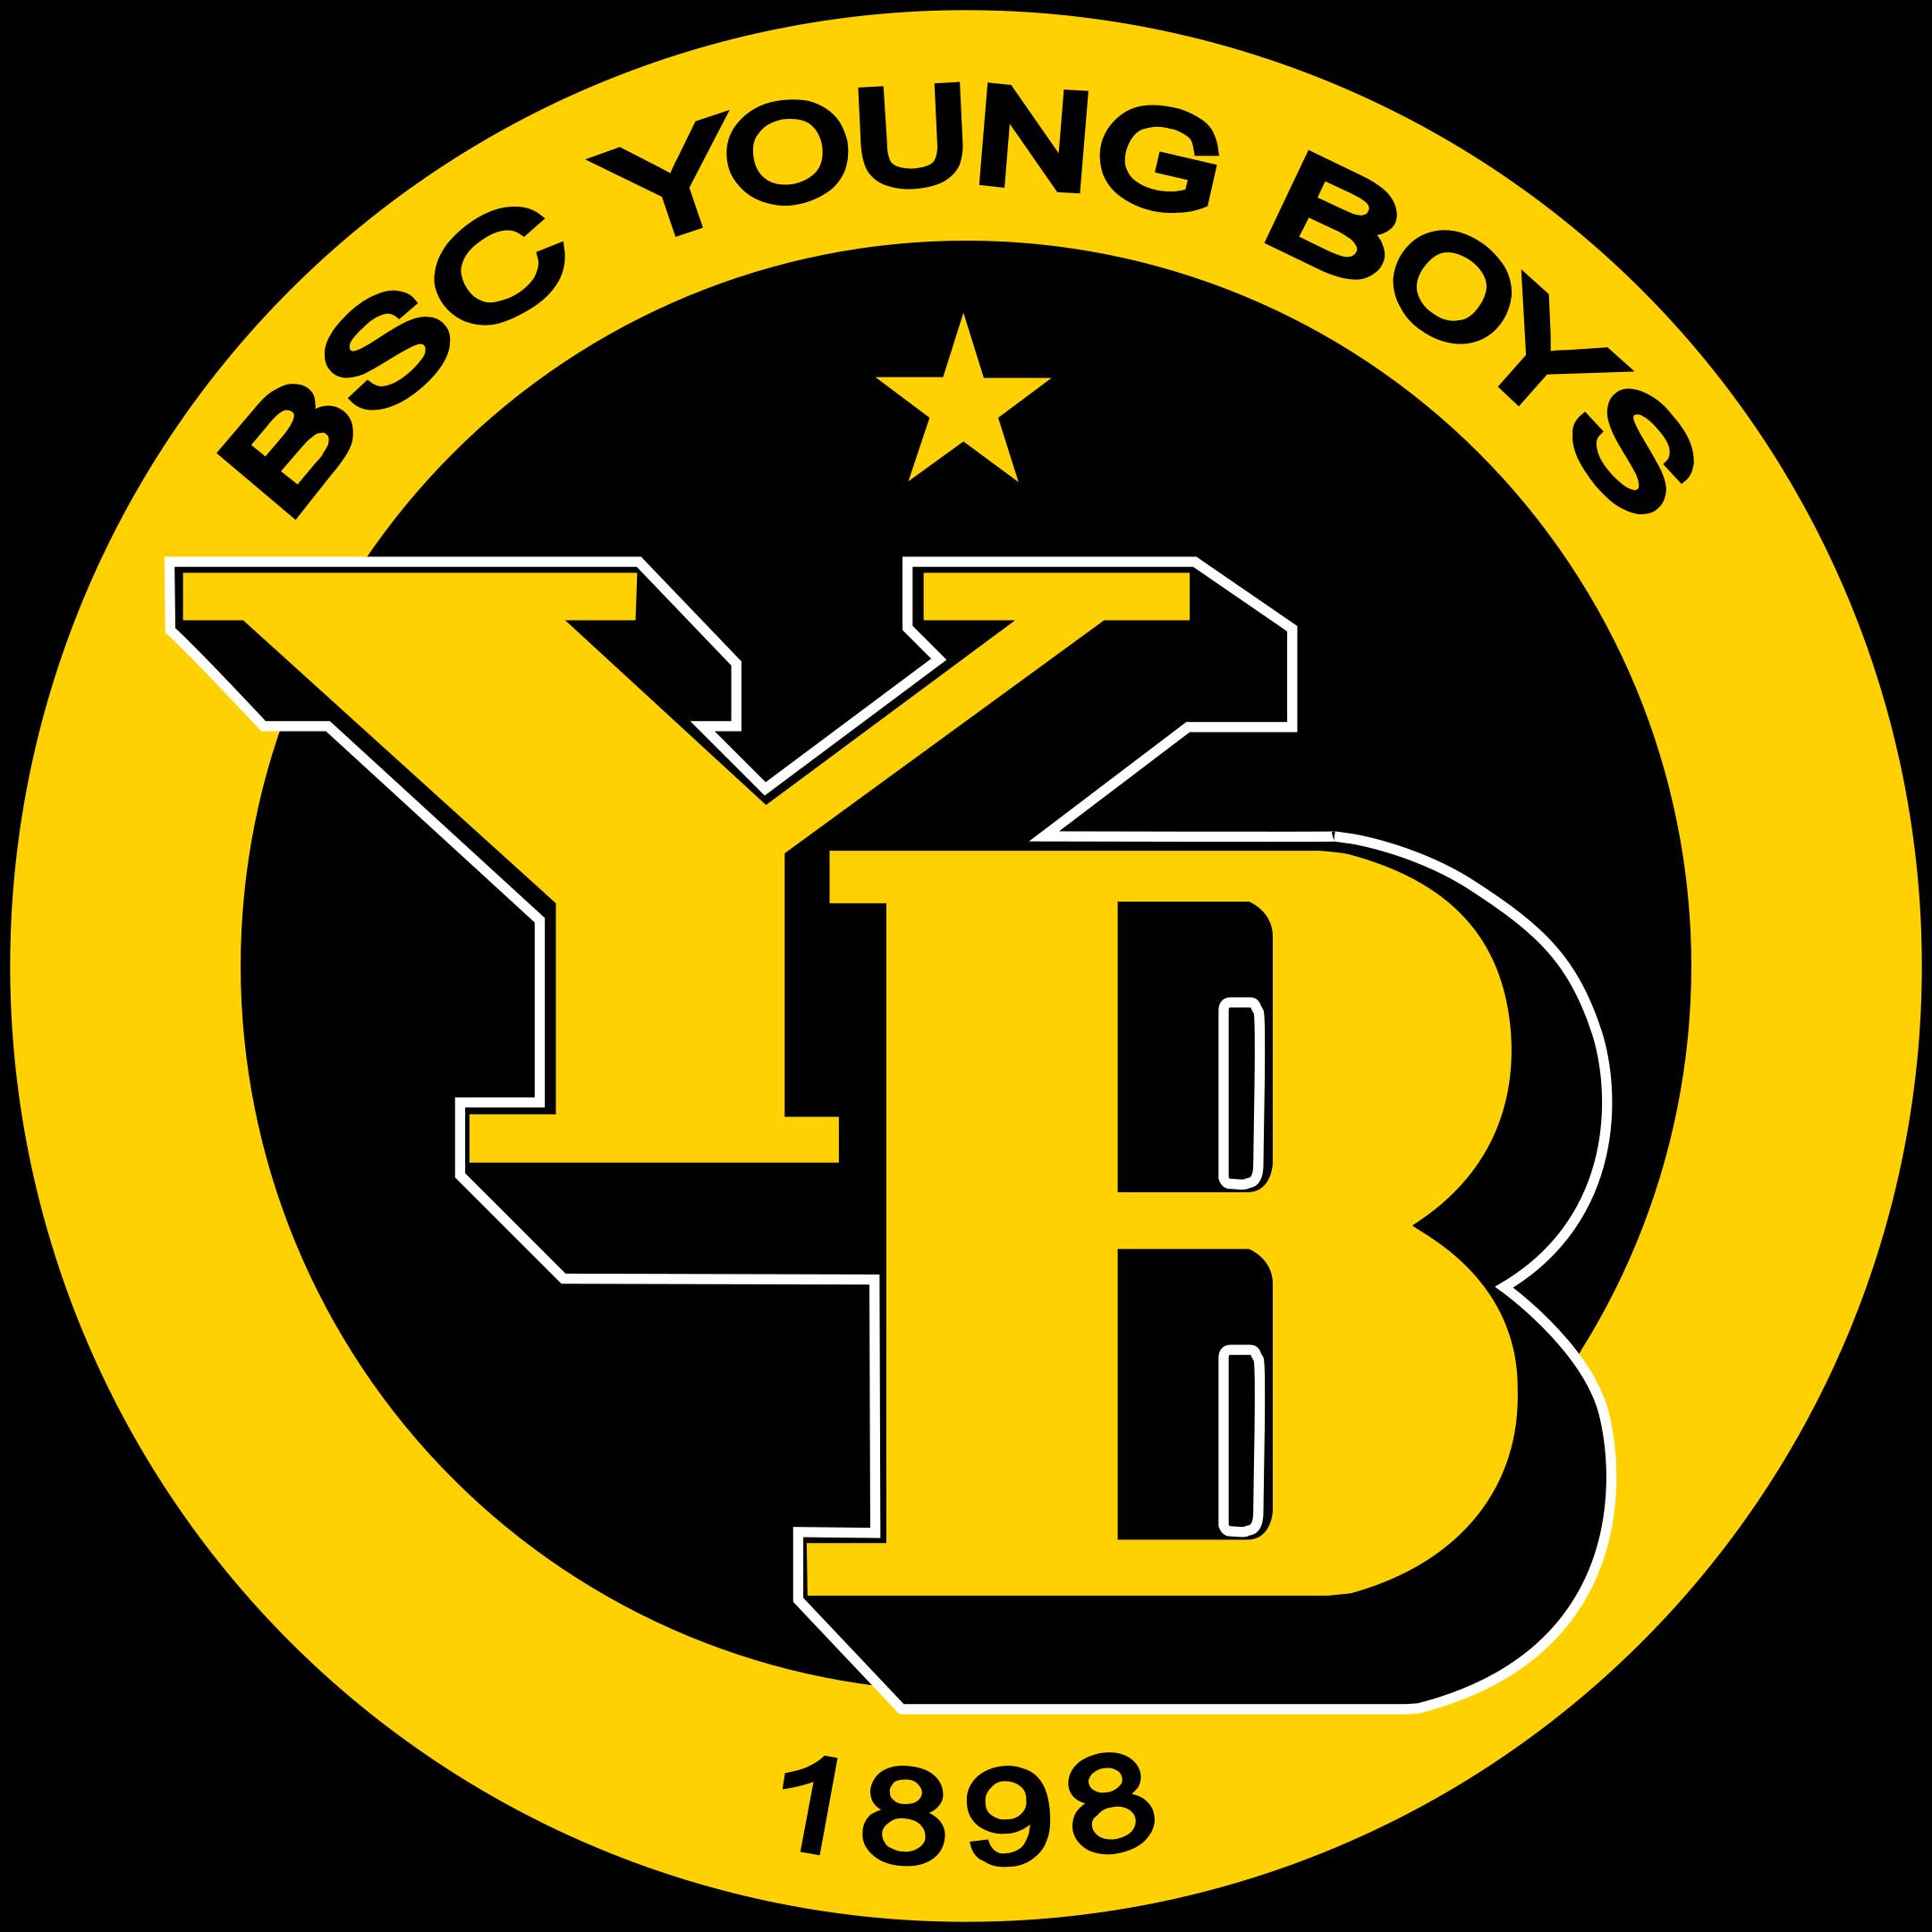 bsc young boys logo 1 - BSC Young Boys Logo